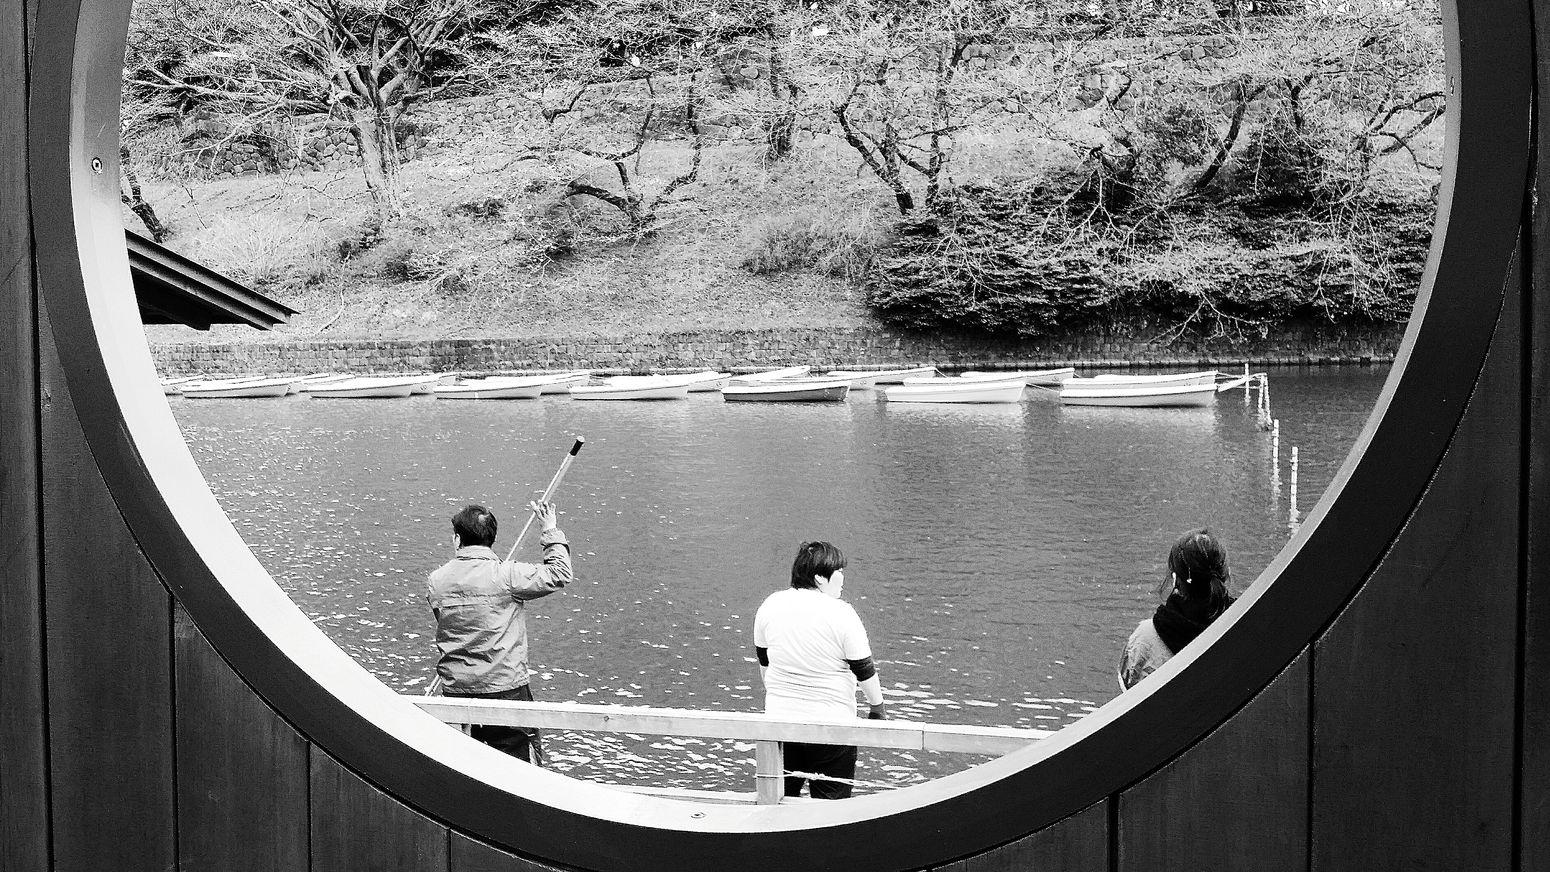 Boating Spring Chidorigafuchi Tokyo Streetphotography Japan Bnw_spring Bnw_tokyo Bnw Nature Bnw_life Bnw_collection Bnw_streetphotography Bnw_planet Eyeemcollection EyeEm Gallery Eyeem Nature EyeEM Tokyo Eyeem Spring Eyeemphotography Eyeem Streetphotography Showcase April